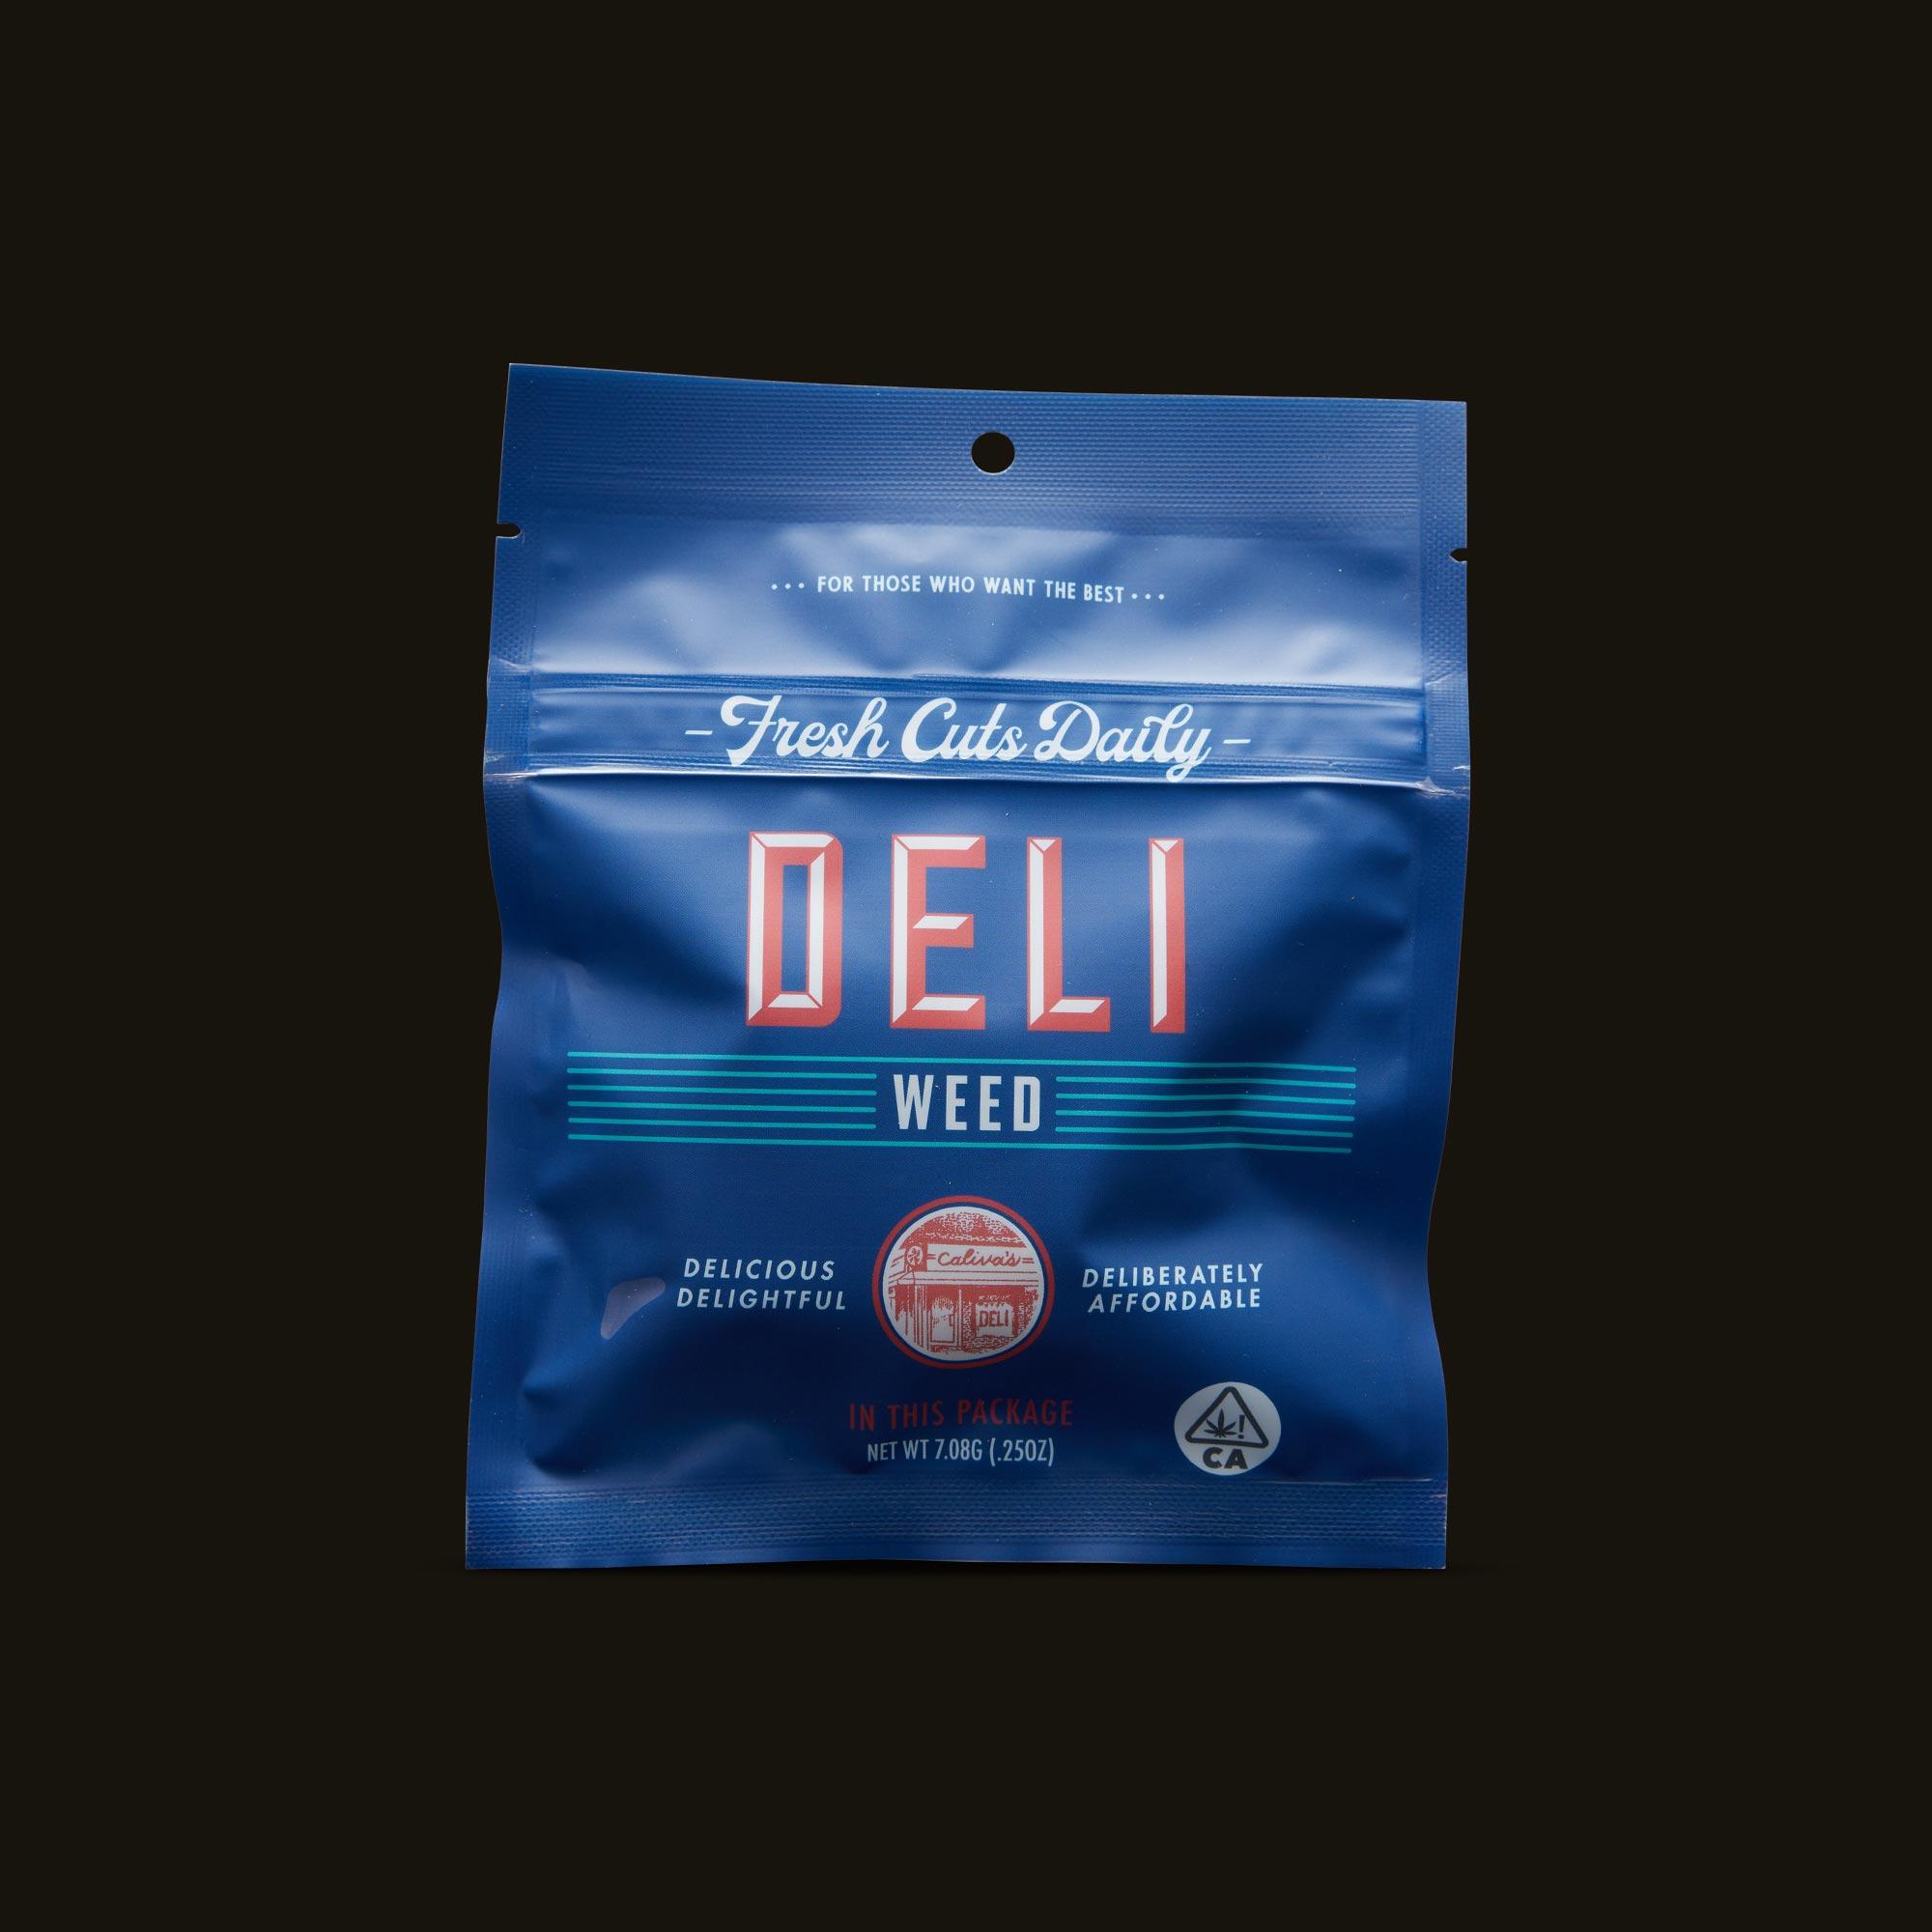 Deli Wedding Cake Front Packaging